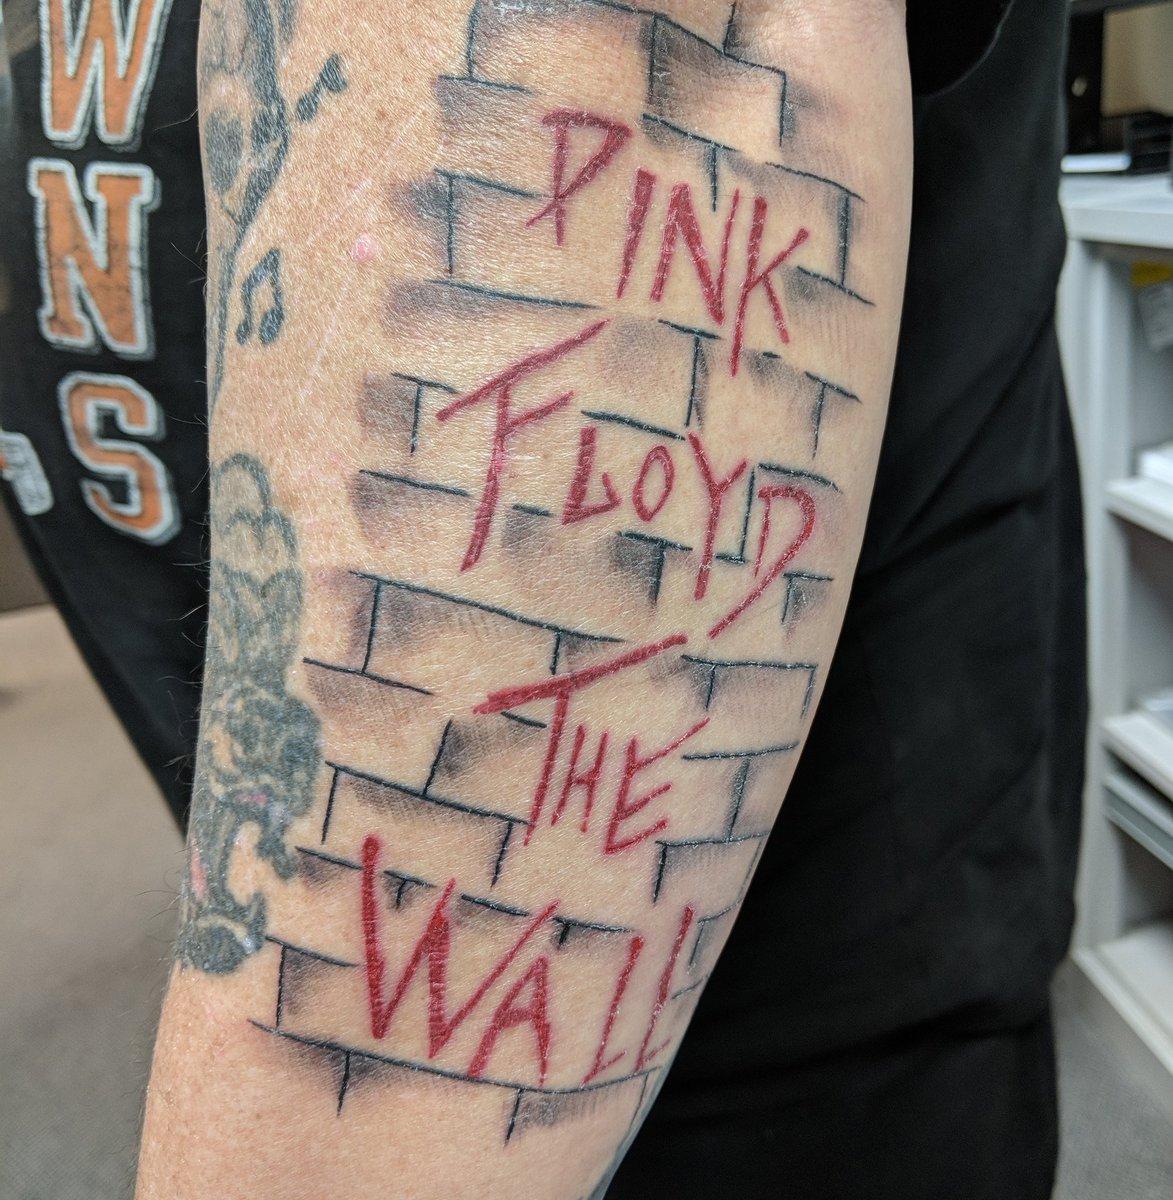 94 5 Xkr On Twitter Grizzly S Pinkfloyd Tattoo Pretty Kick Ass